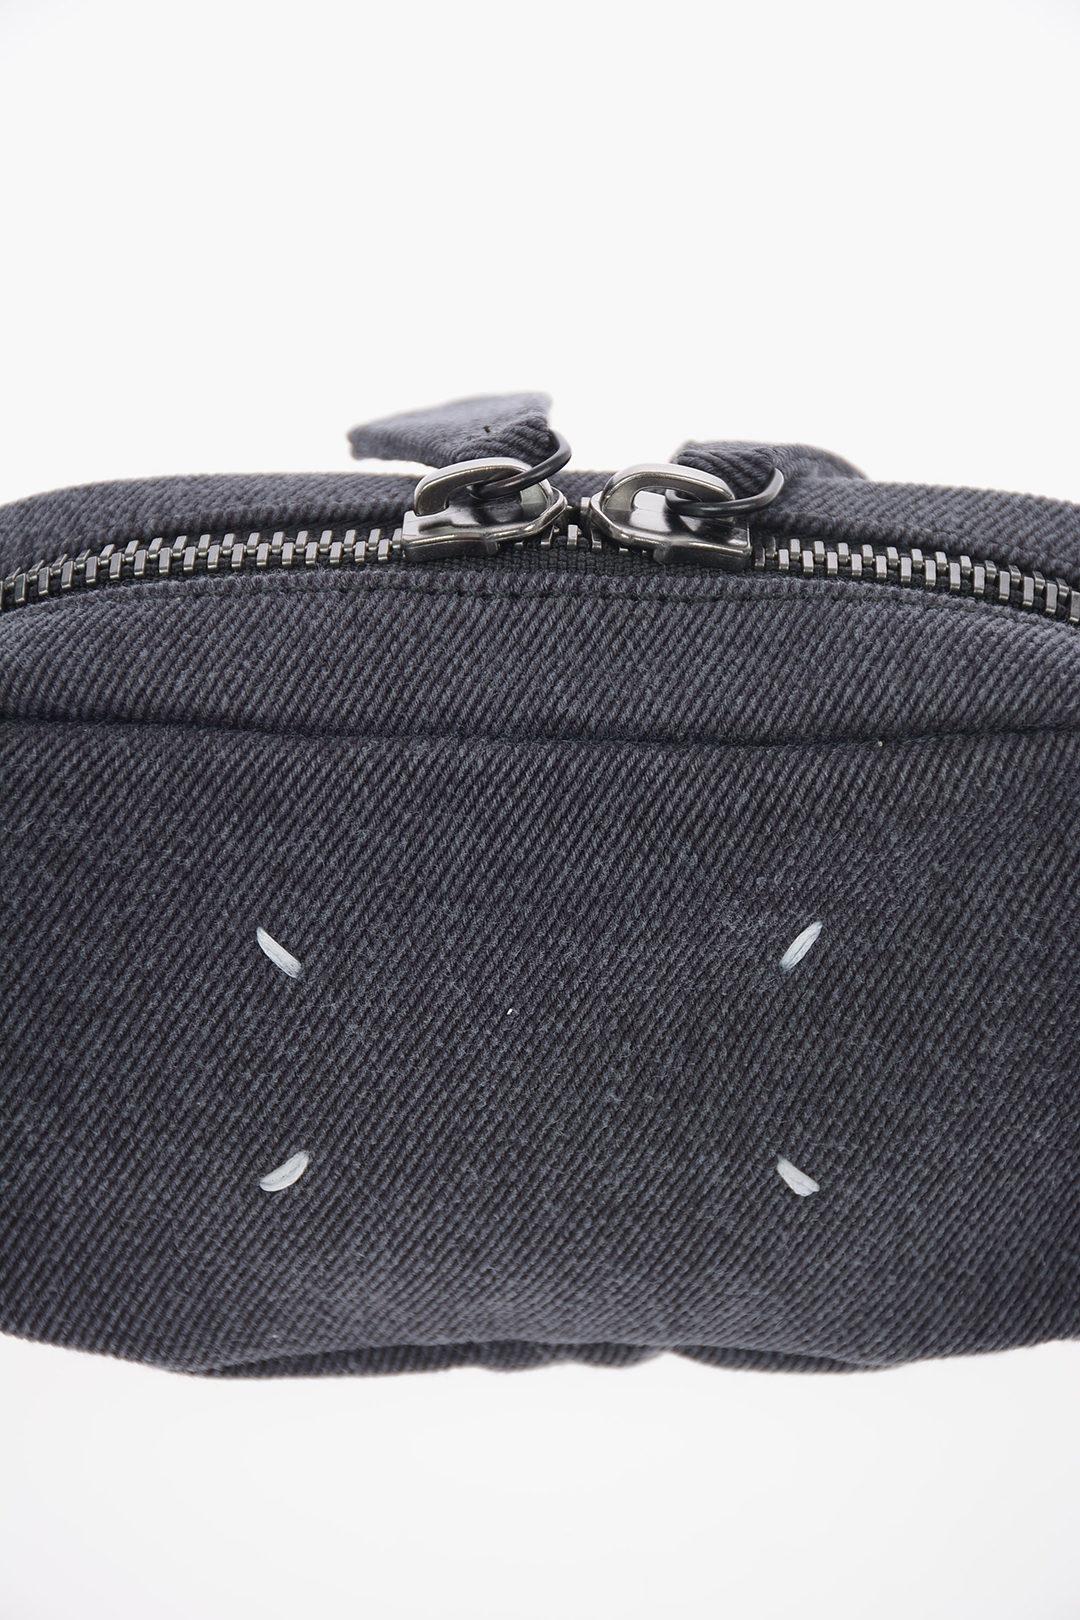 LOUIS VUITTON Monogram Denim Bum Bag Blue 526803